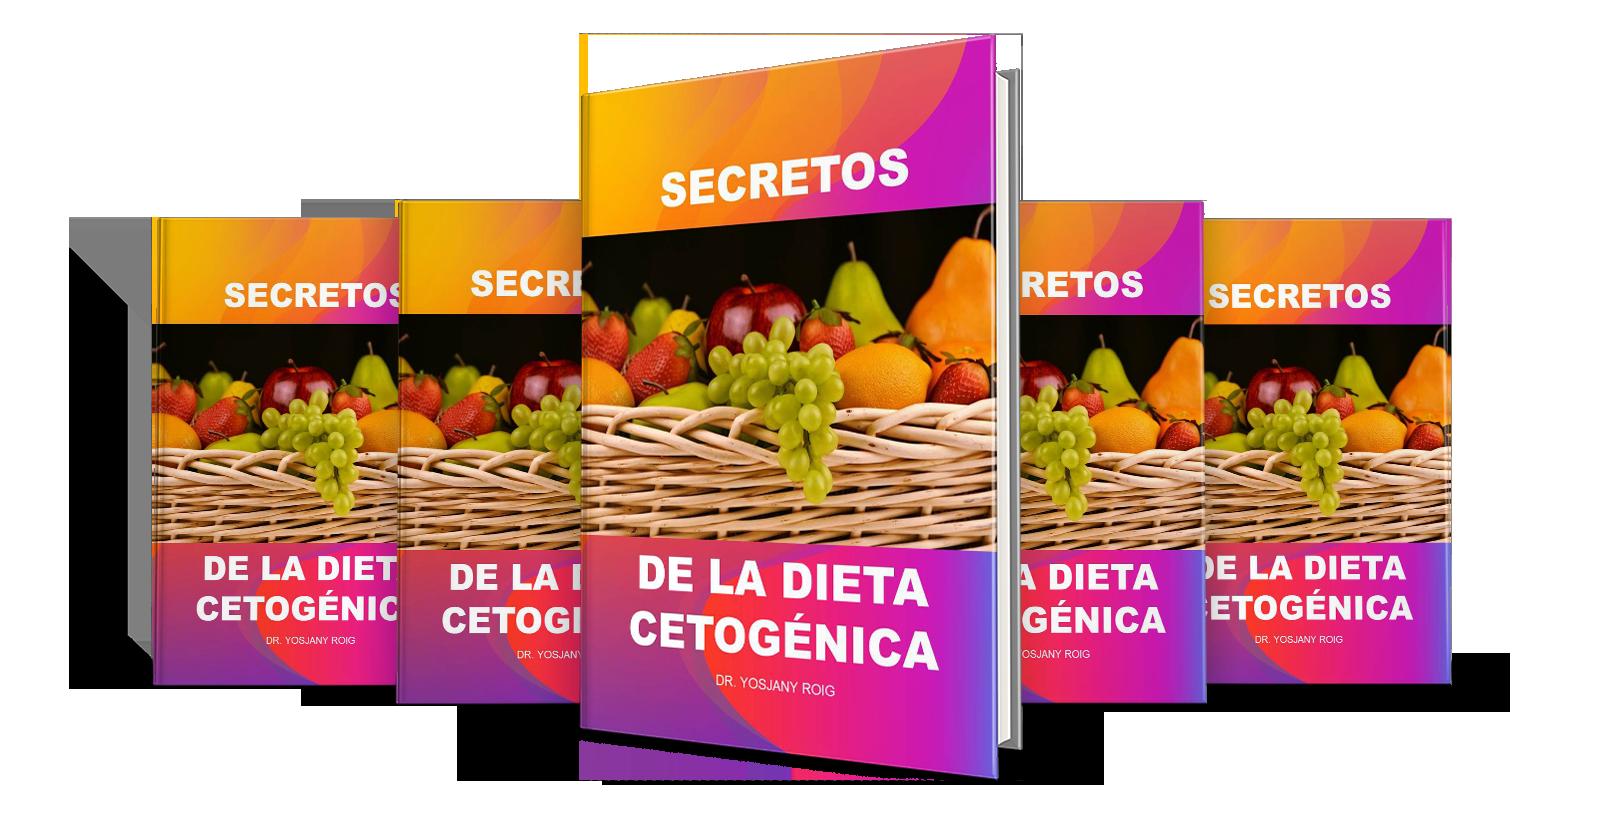 Dieta Cetogénica Keto 5 ebooks 1